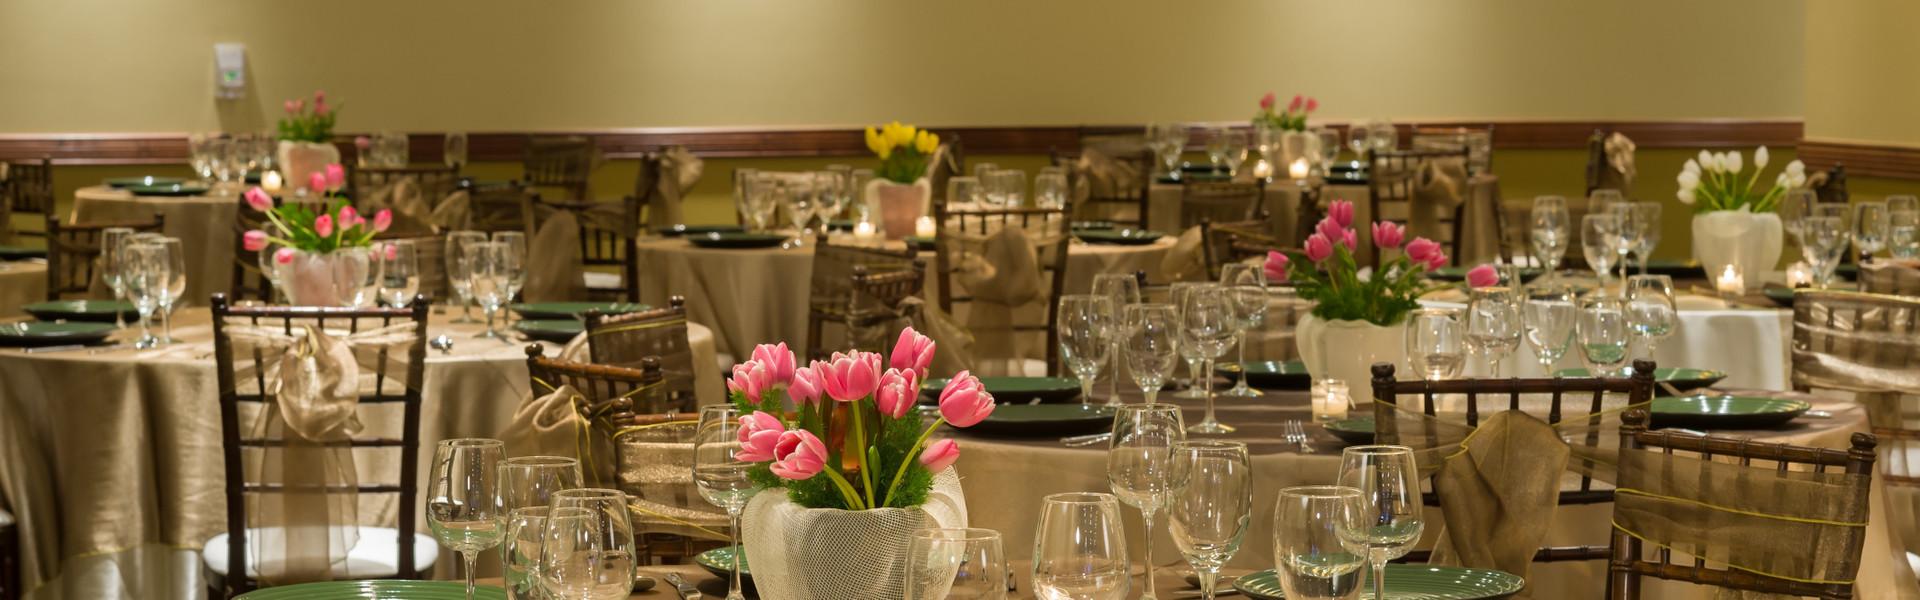 Annual General Meeting (AGM) Hotel Deals Near Disney World -